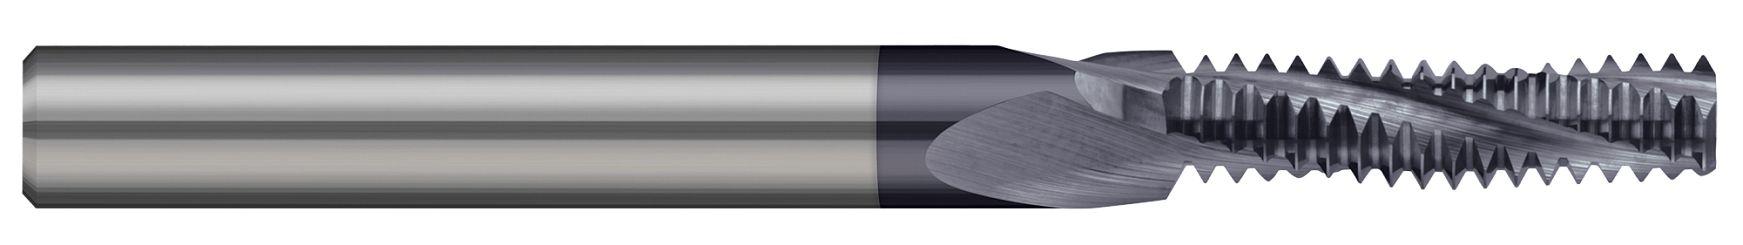 Thread Milling Cutters - Multi-Form - Long Flute - UN Threads